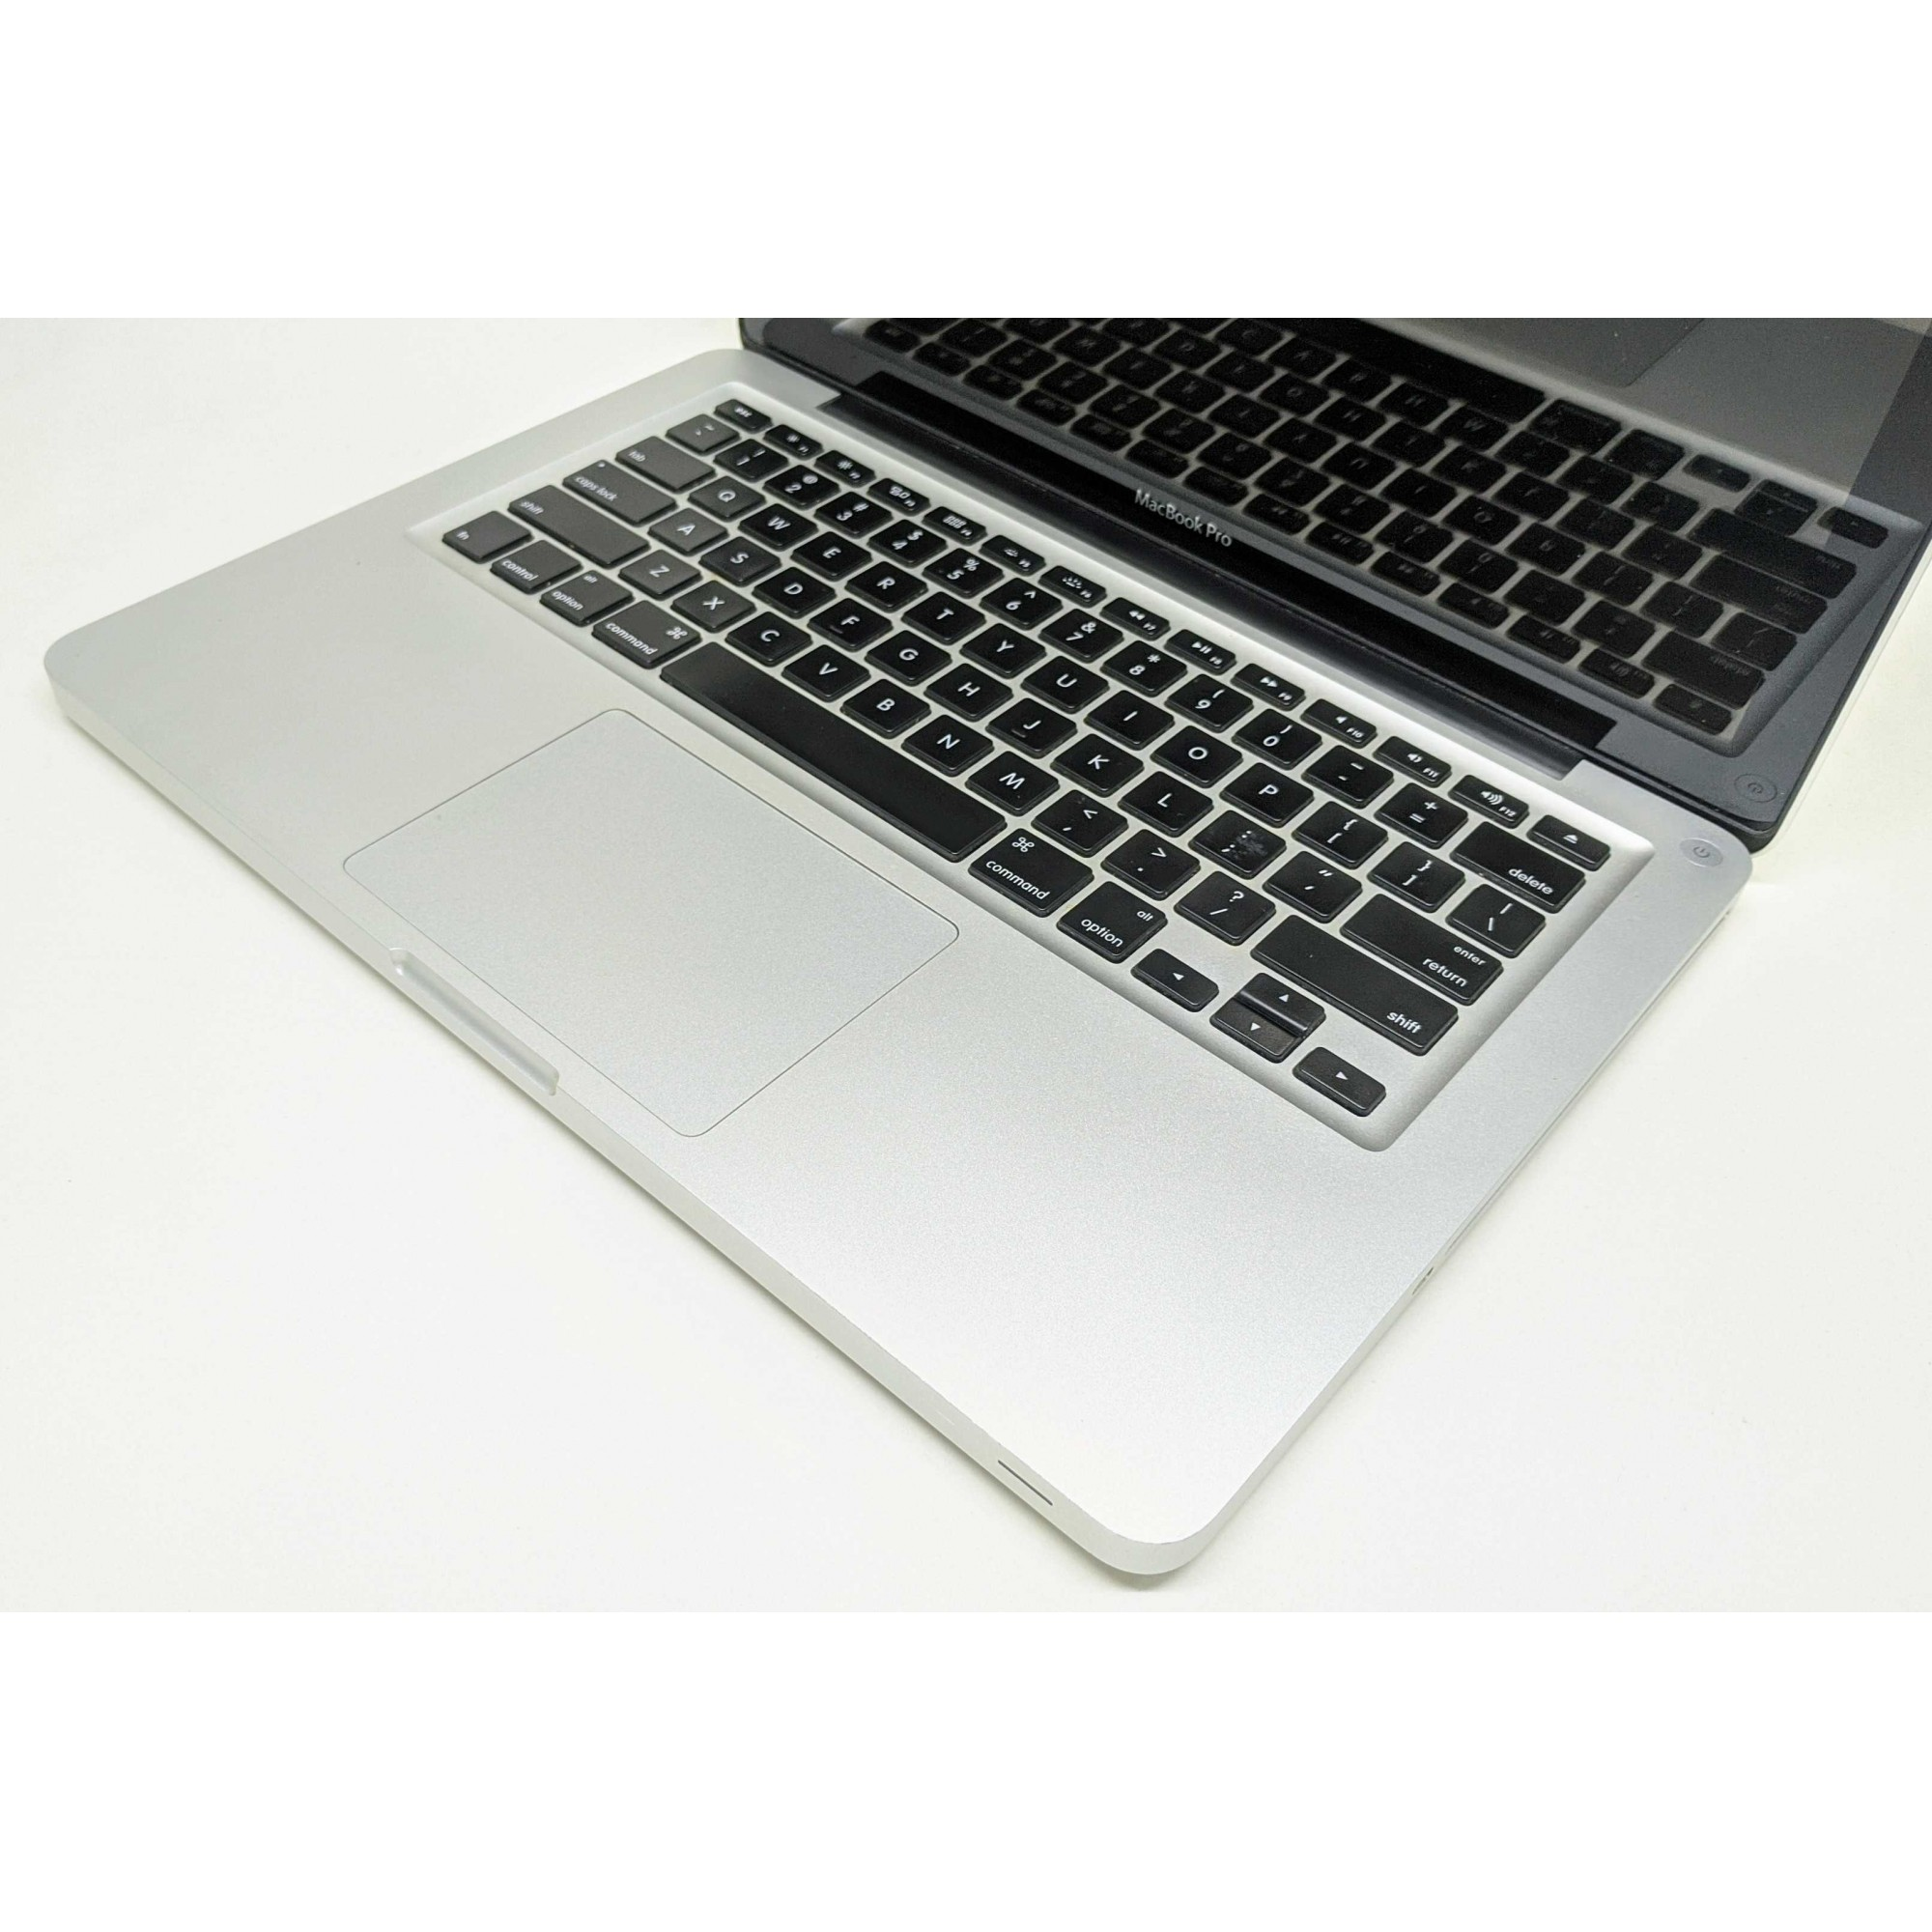 Apple Macbook Pro 9 2 A1278 I7 2 9ghz 8gb 240gb 2012 Grade B Usado Resystech